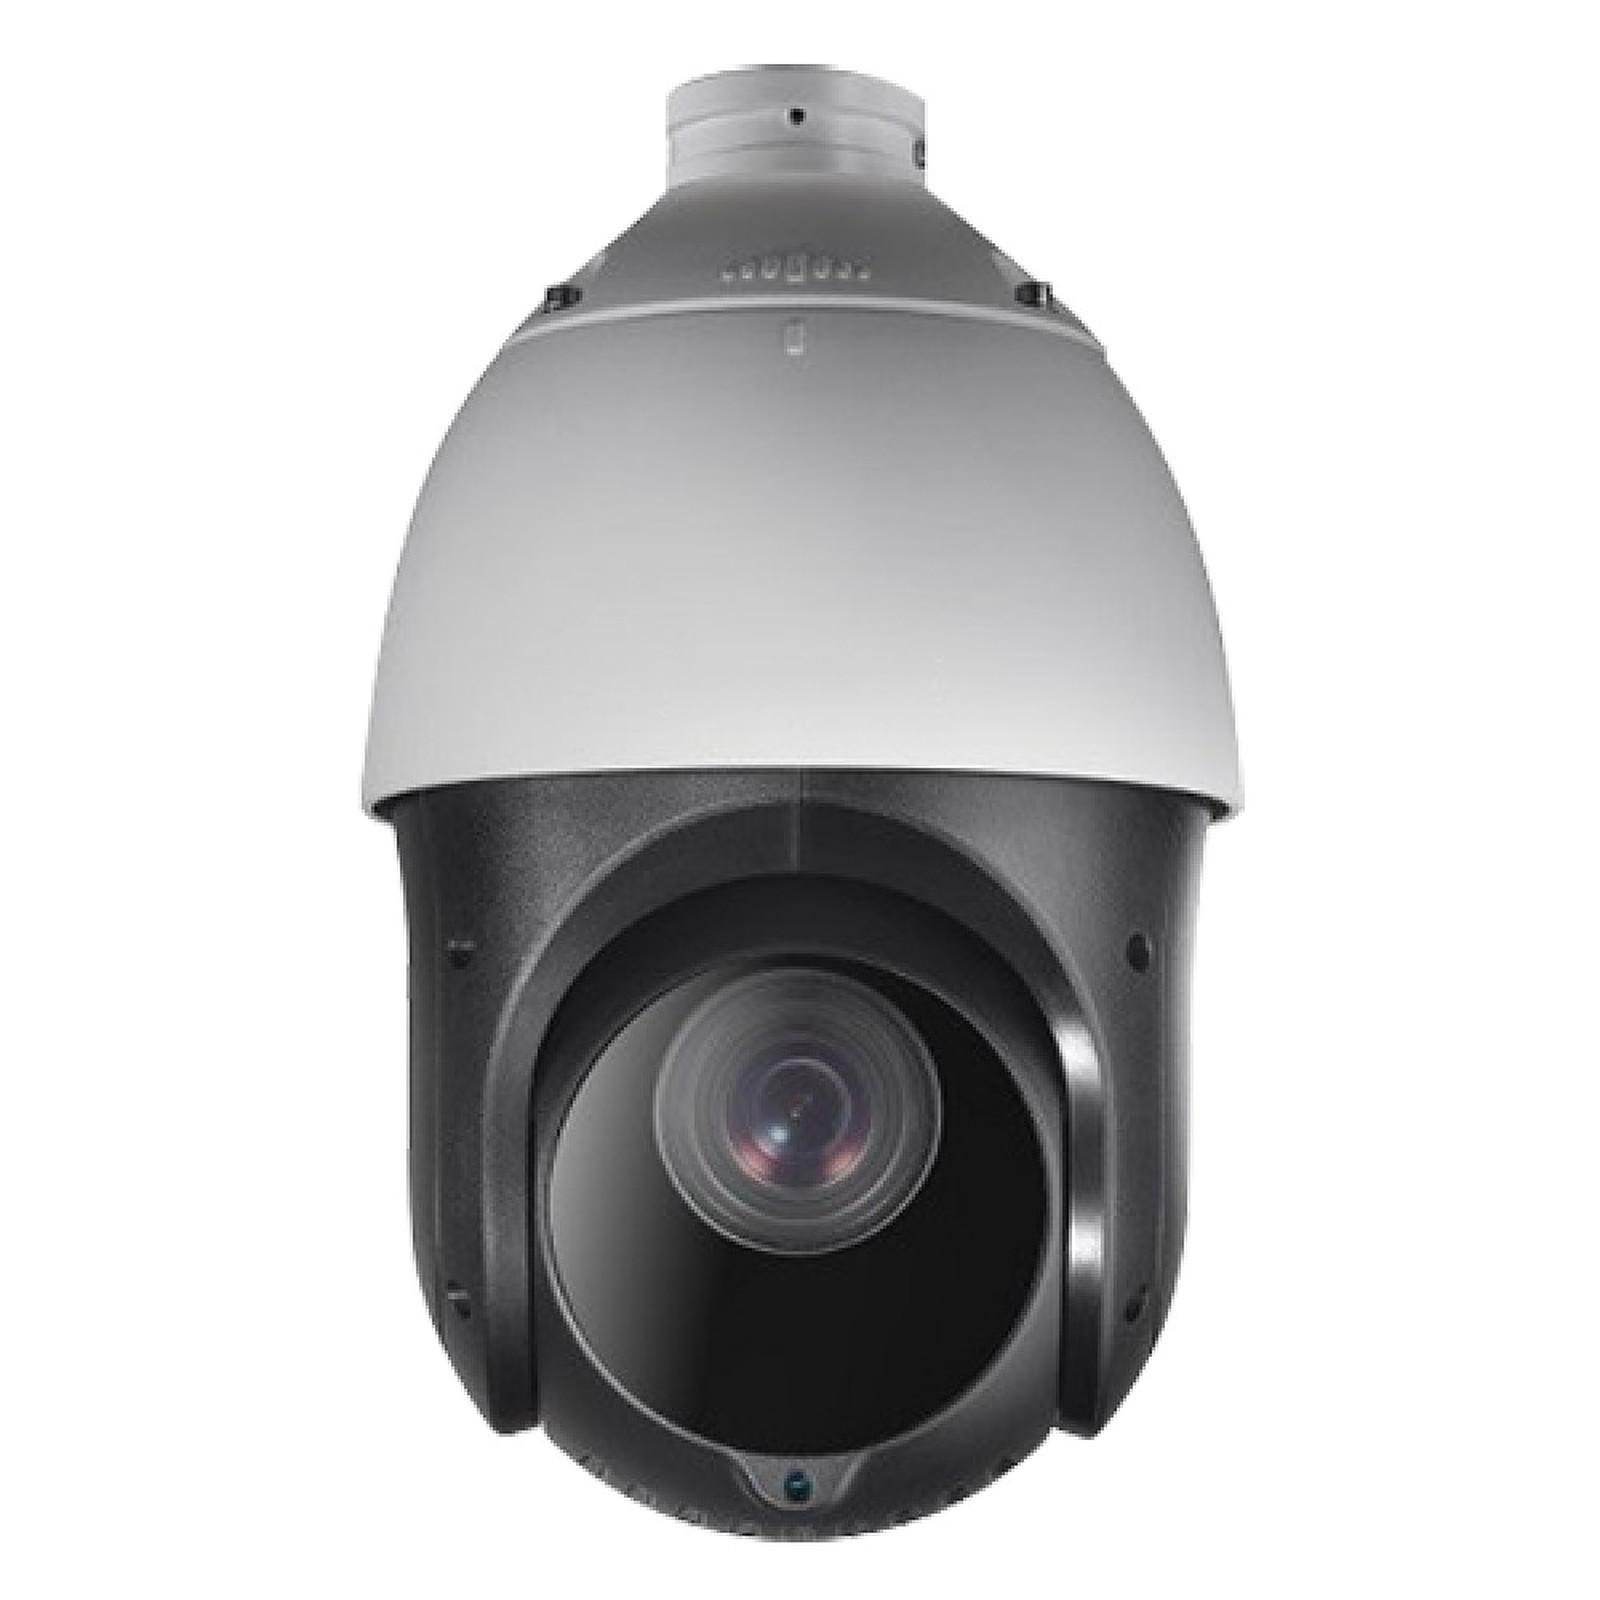 Safire Caméra Ip Motorisée 2mpx, Zoom 25x, Ultra Low Light SAF_IPSD6025UIWH-2